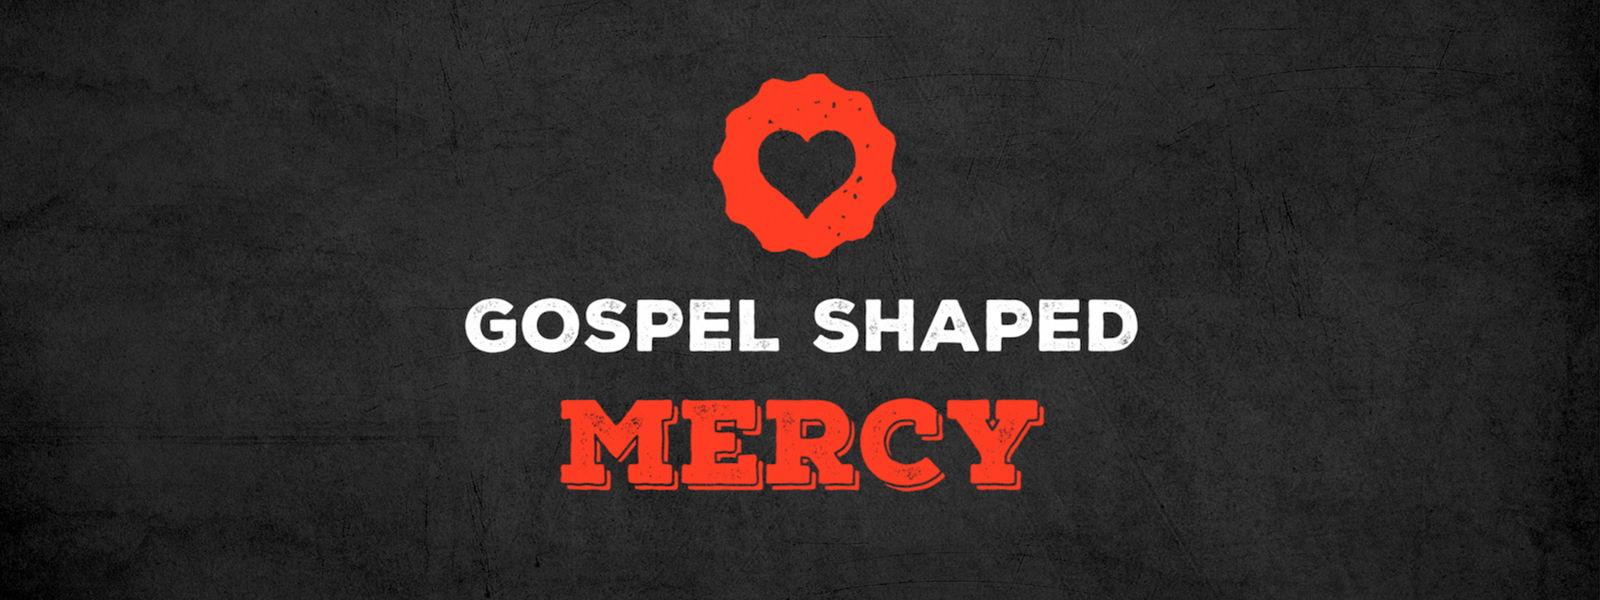 Gospel Shaped Mercy